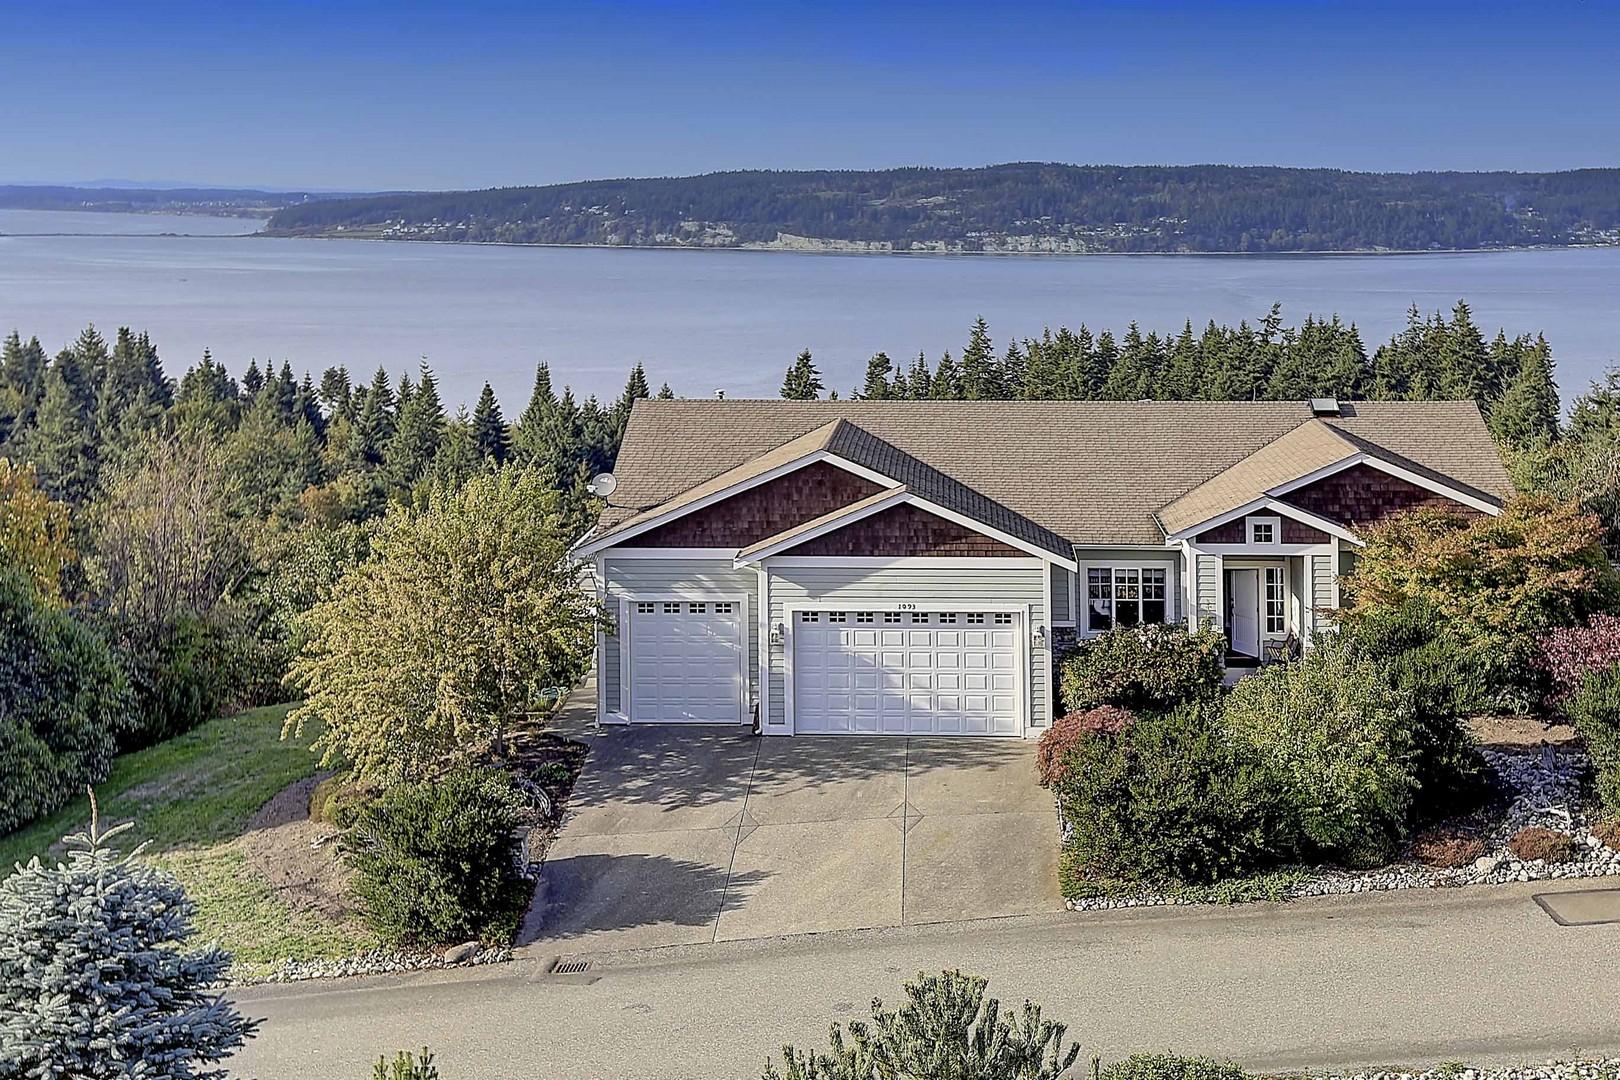 Single Family Home for Sale at Brentwood Ridge 1093 Malvern Hills Dr Camano Island, Washington 98282 United States